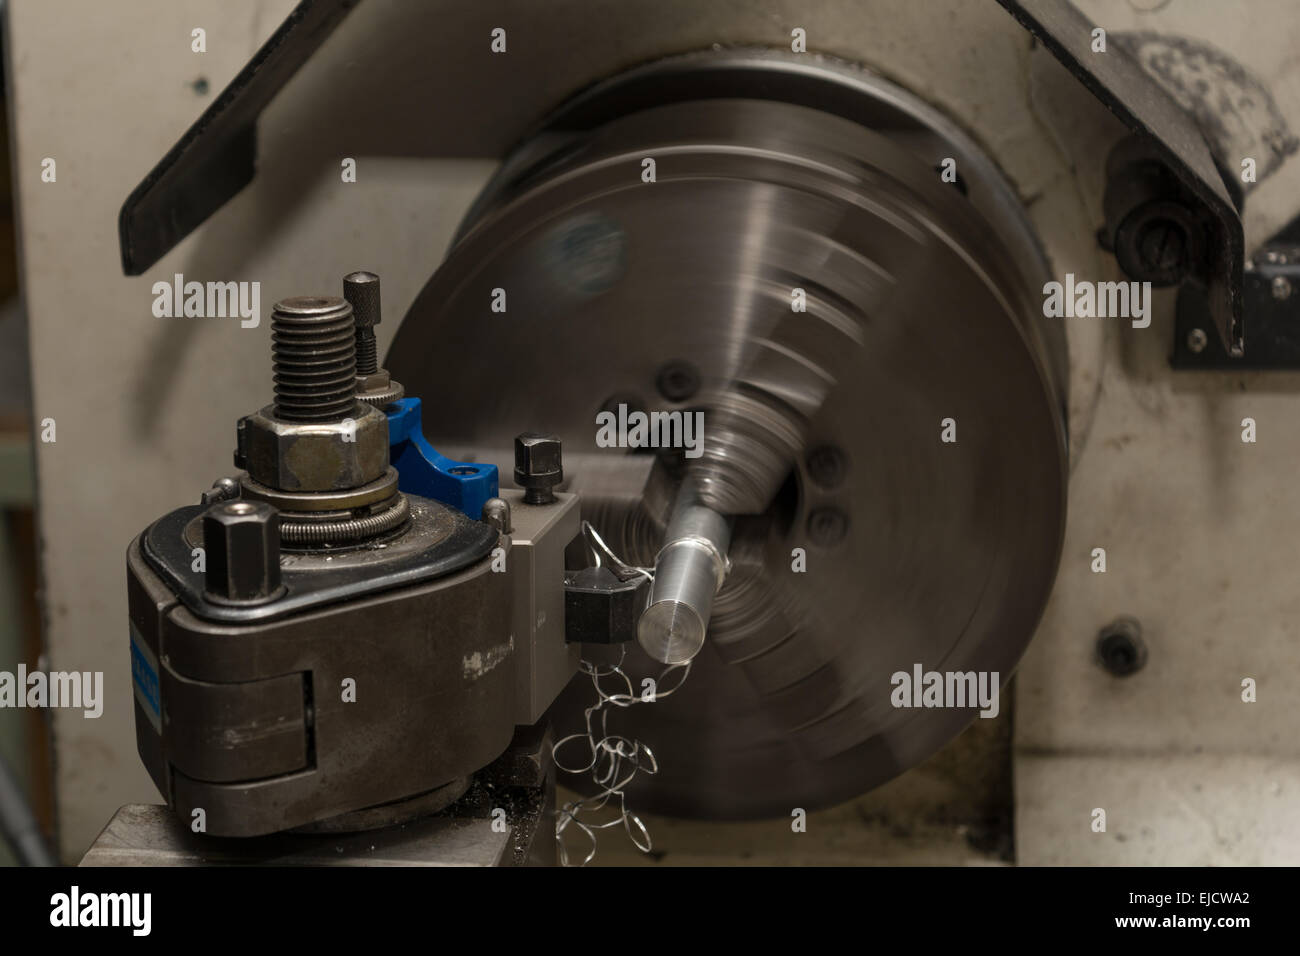 Metallbearbeitung mit Drehbank Stockbild